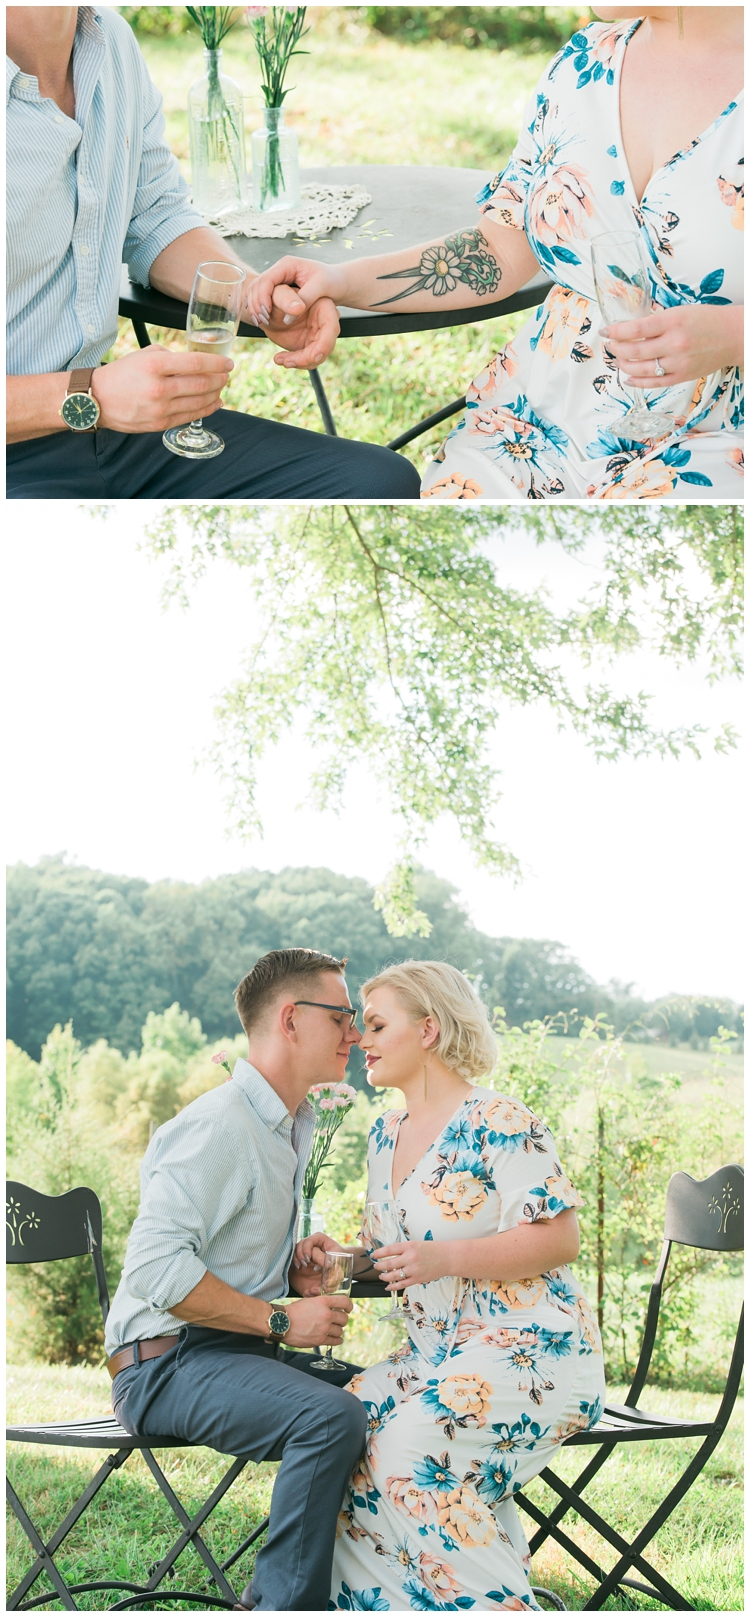 EngagementPhotography_1018.jpg